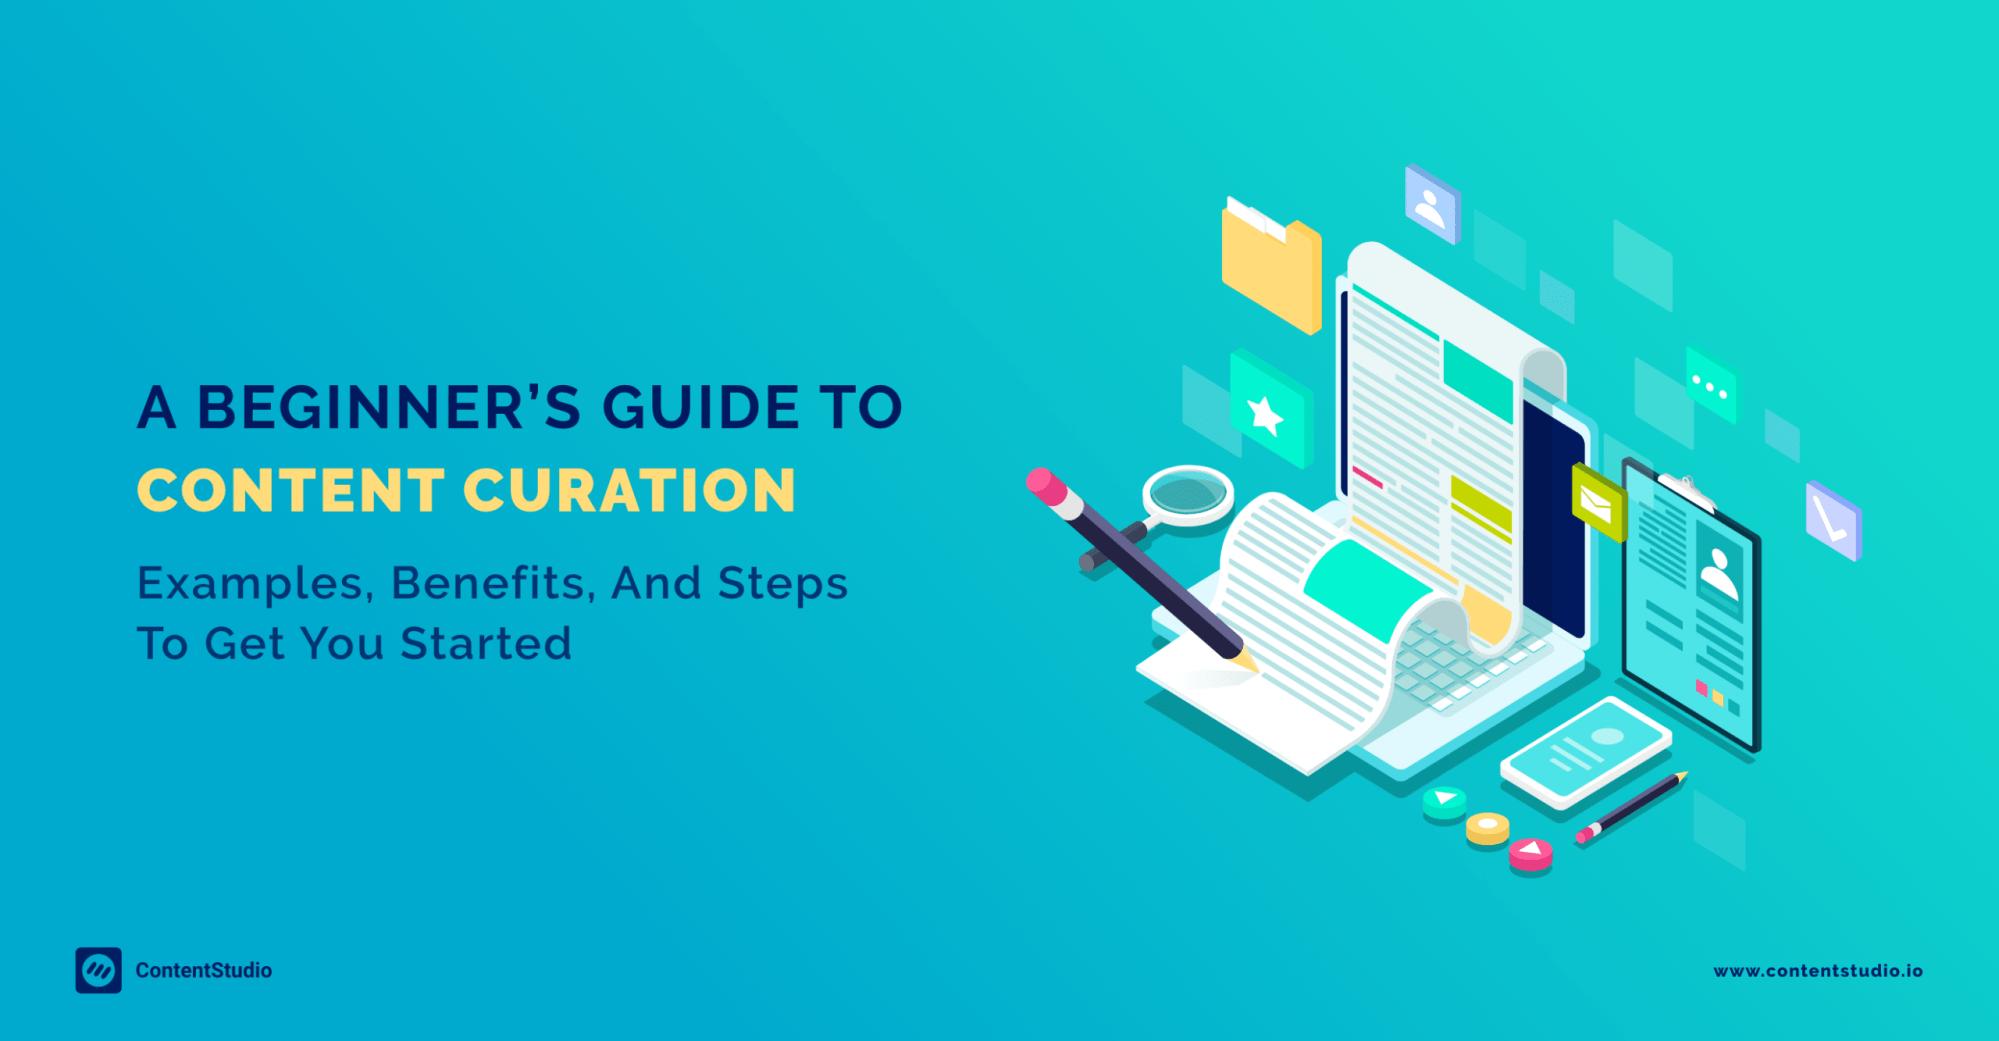 content curation guide - ContentStudio